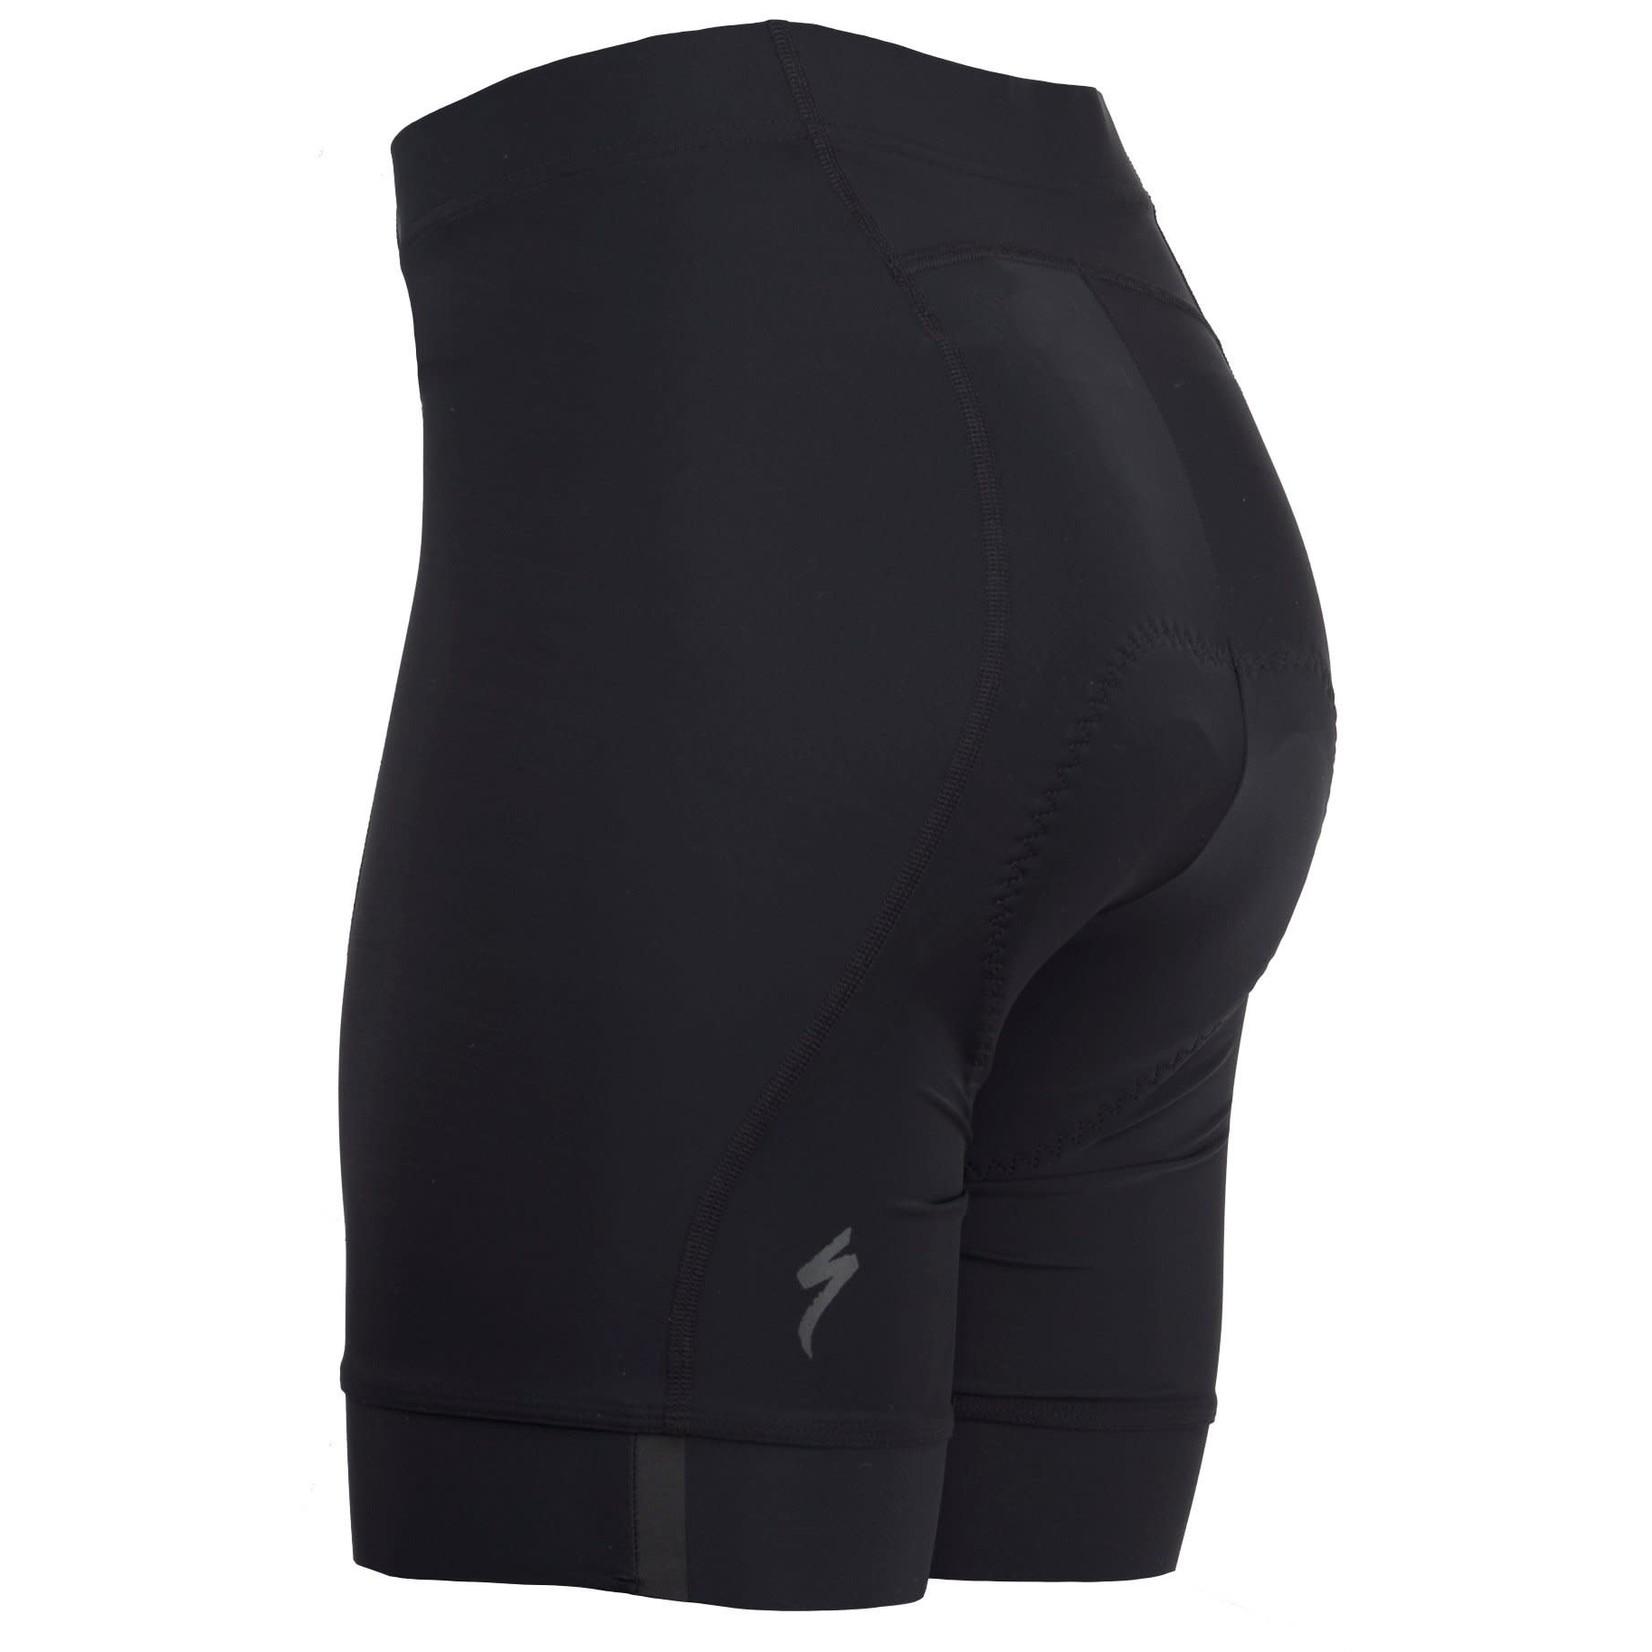 Specialized RBX WMNS Short Black Large